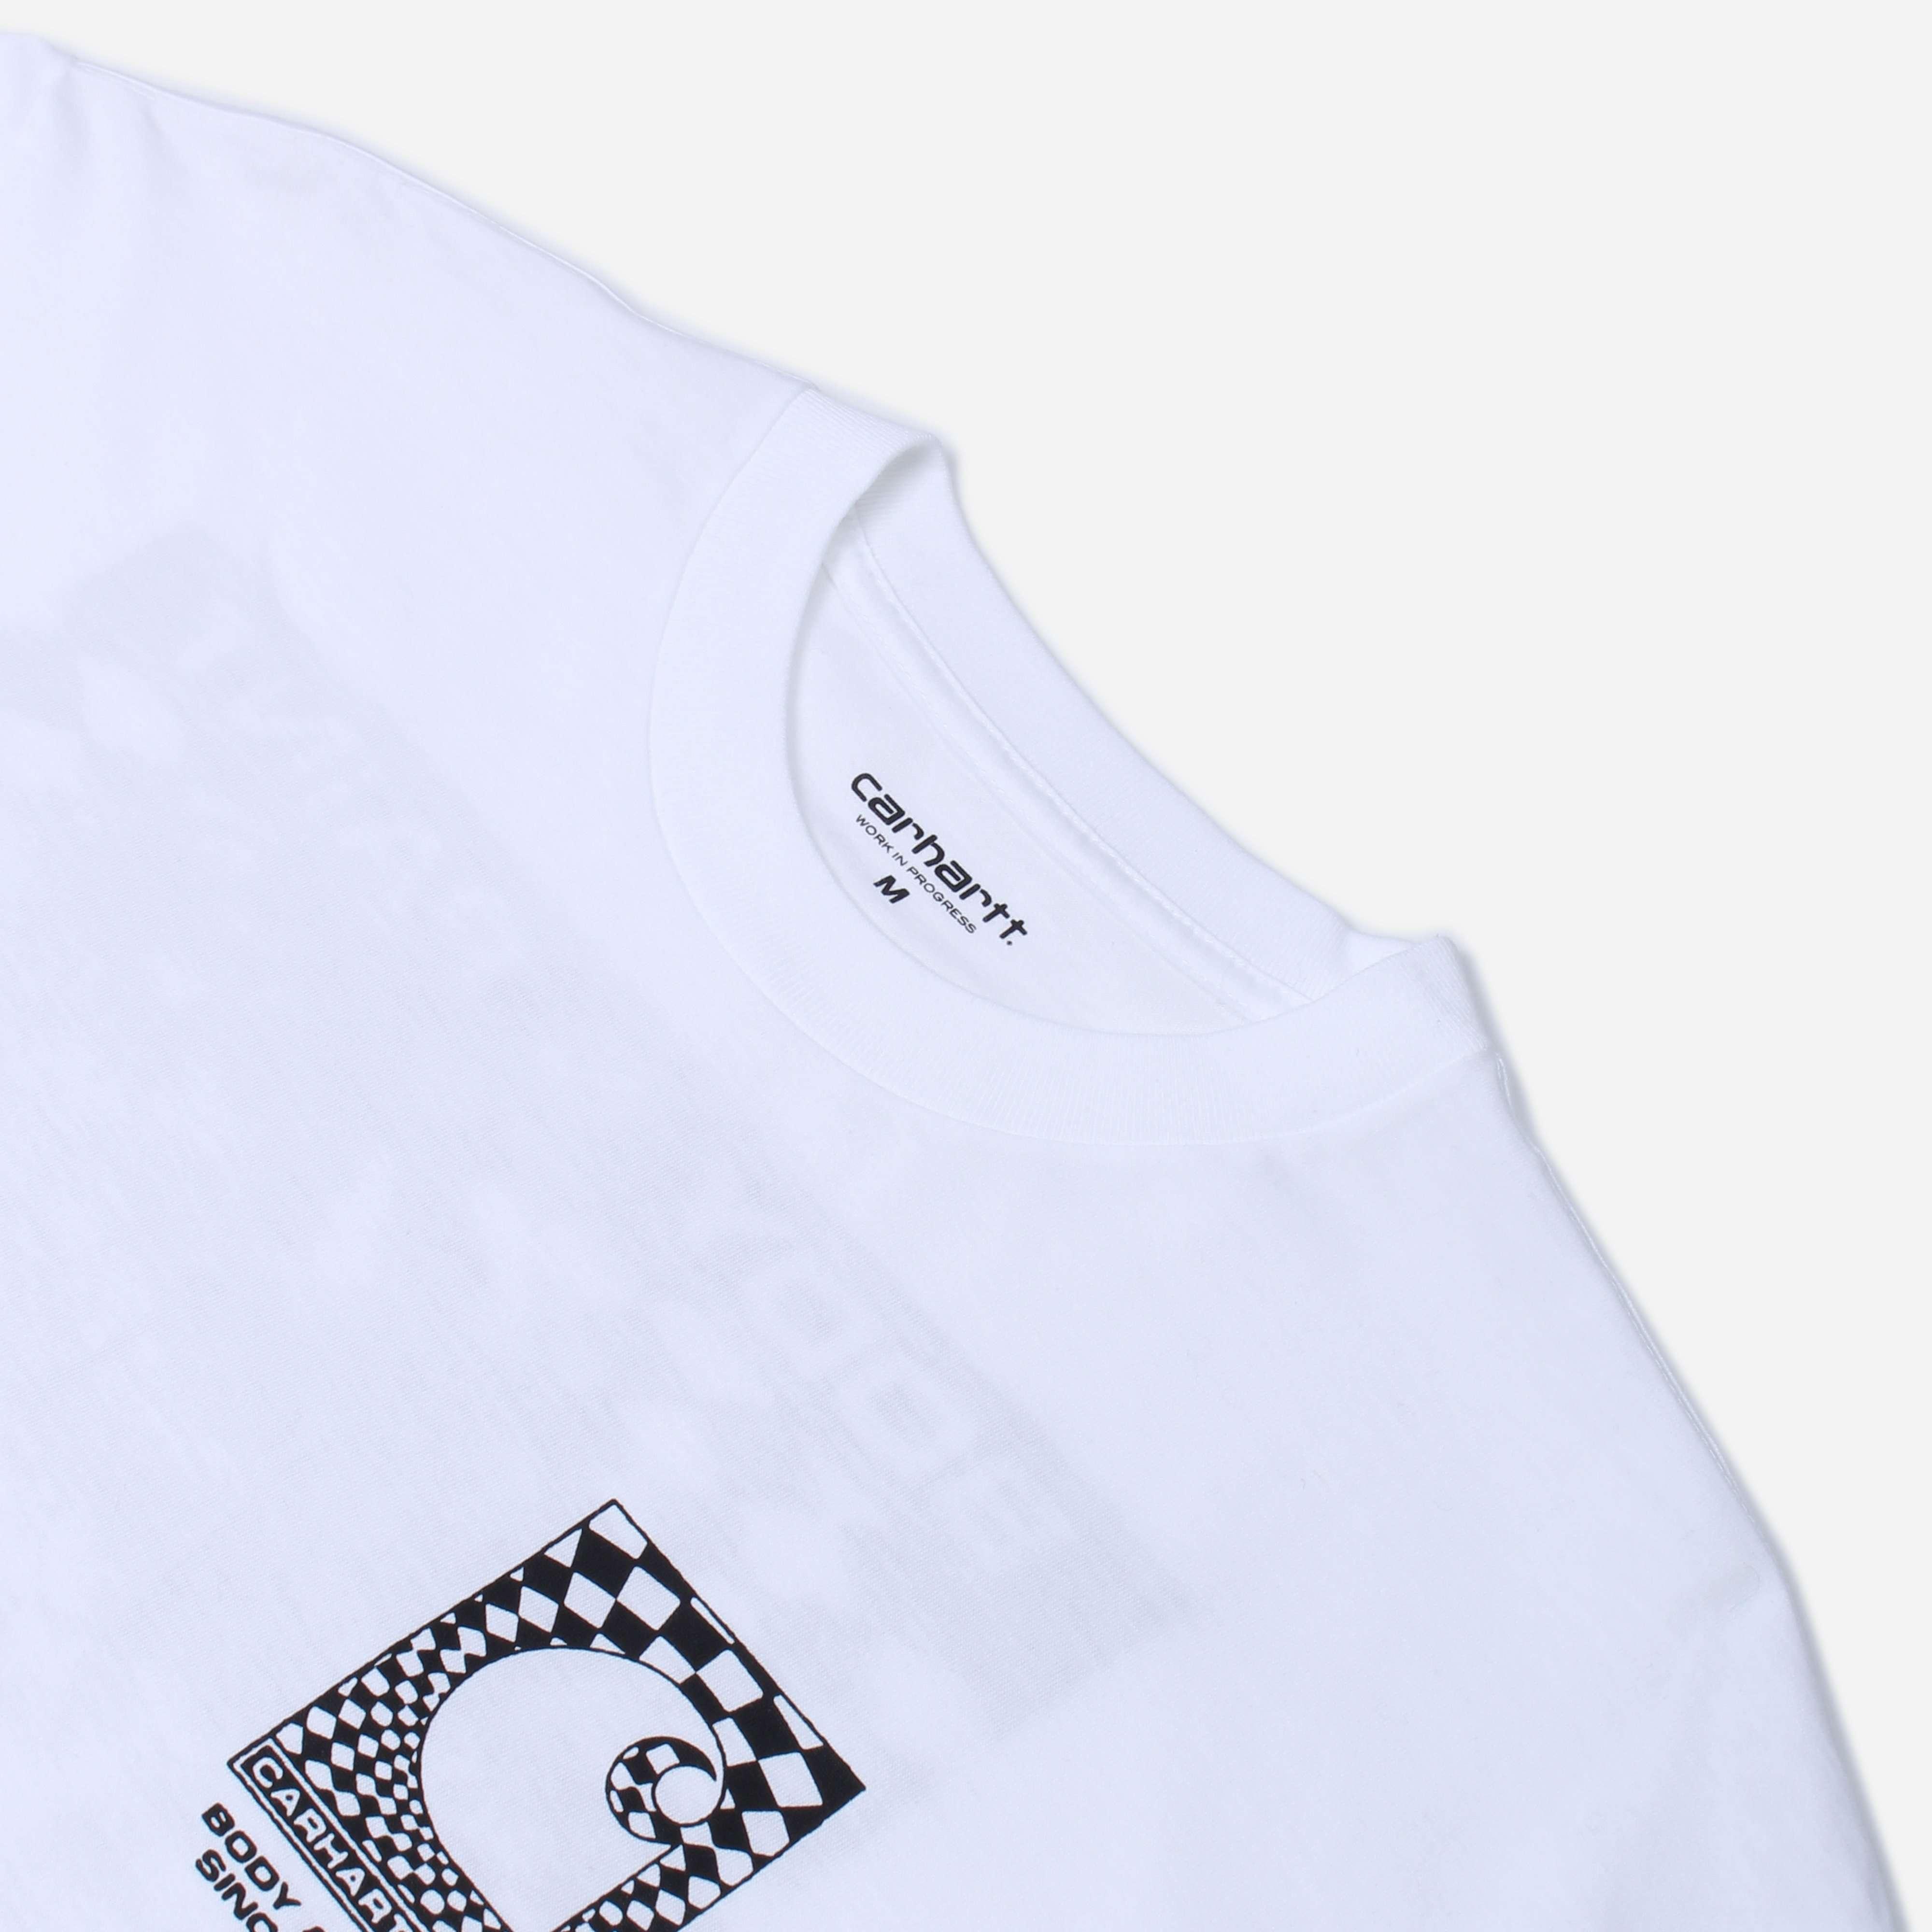 Carhartt WIP Body & Paint T-Shirt